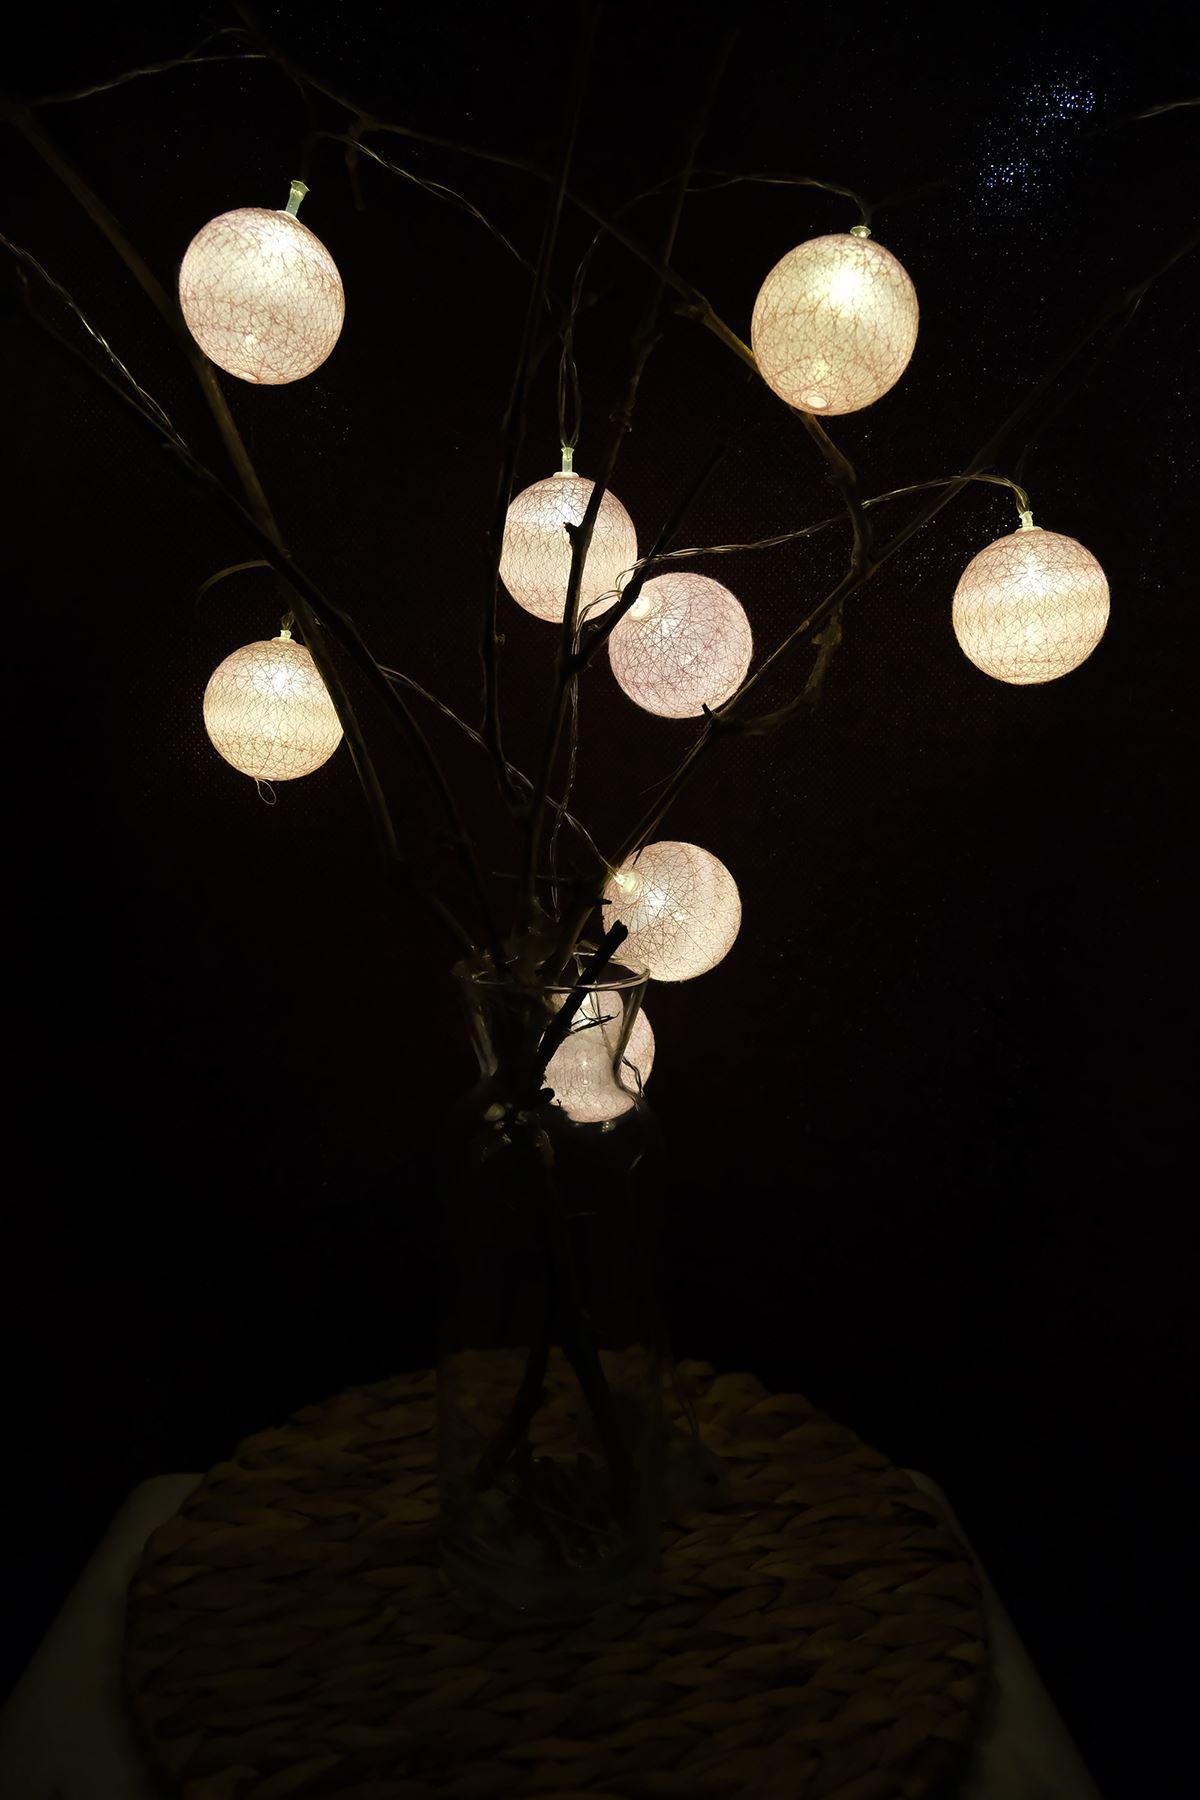 Ledli Top Işık Pembe - 4942.1342.